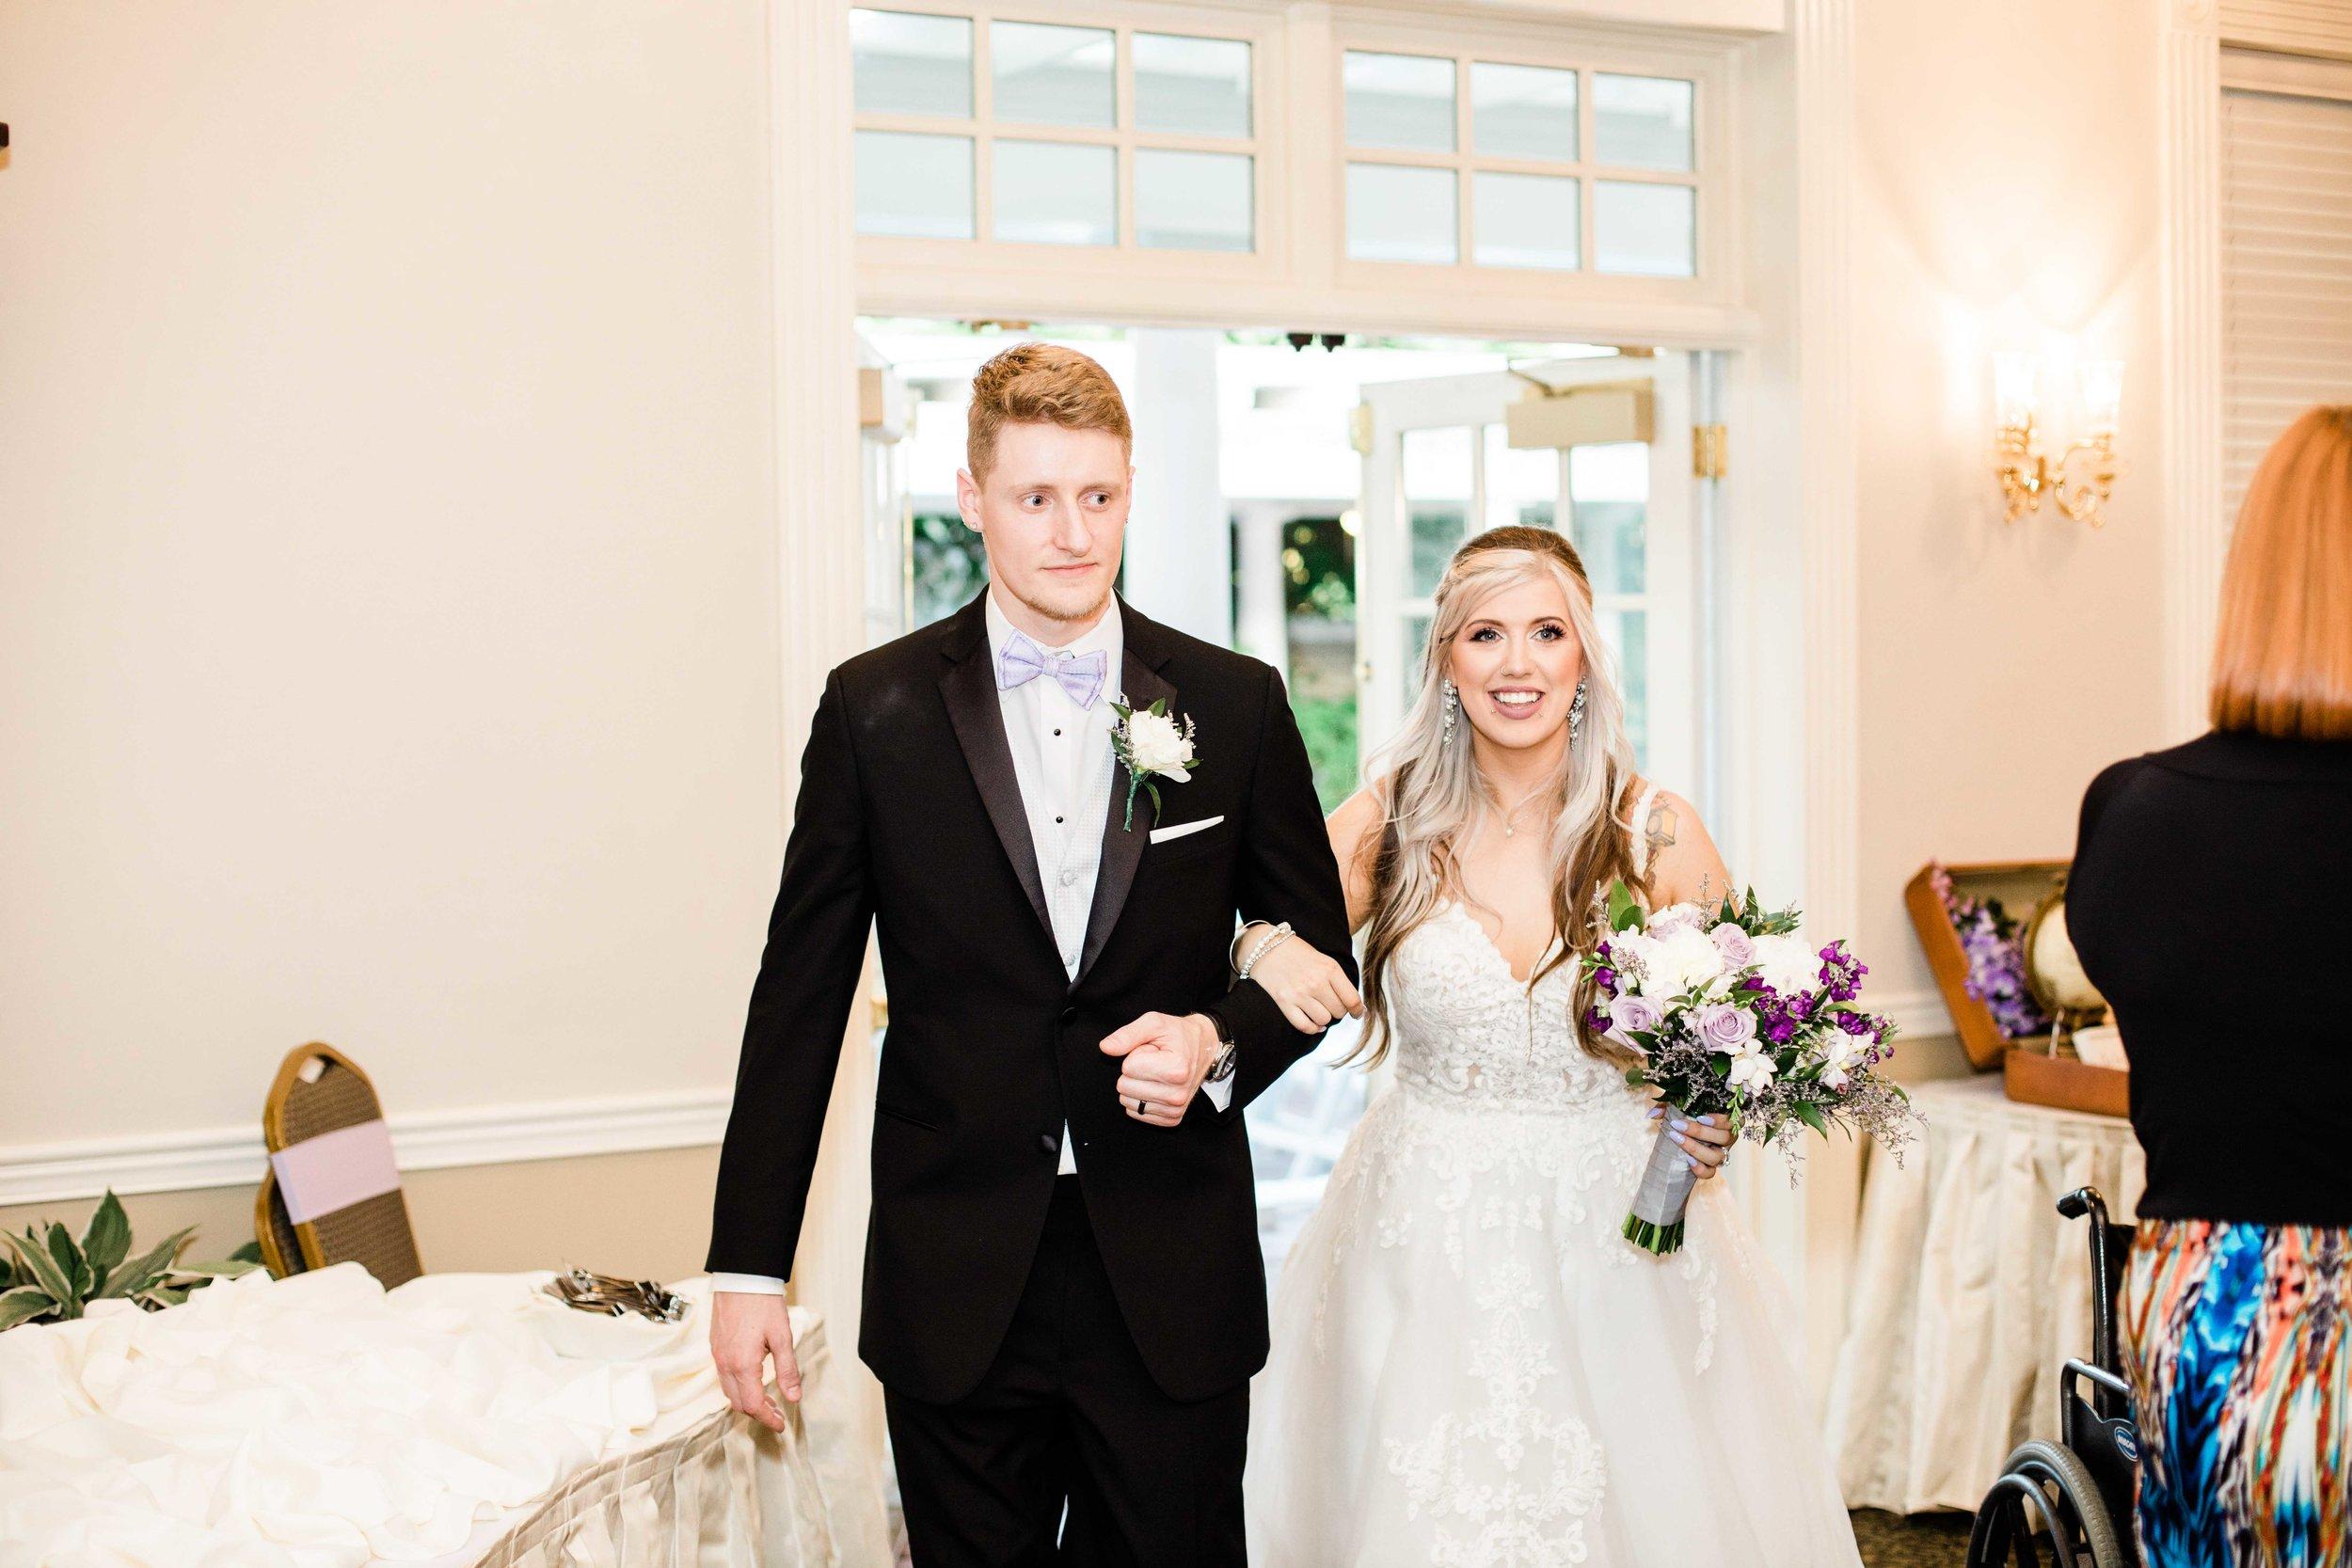 manor house reception ohio wedding photography-1.jpg